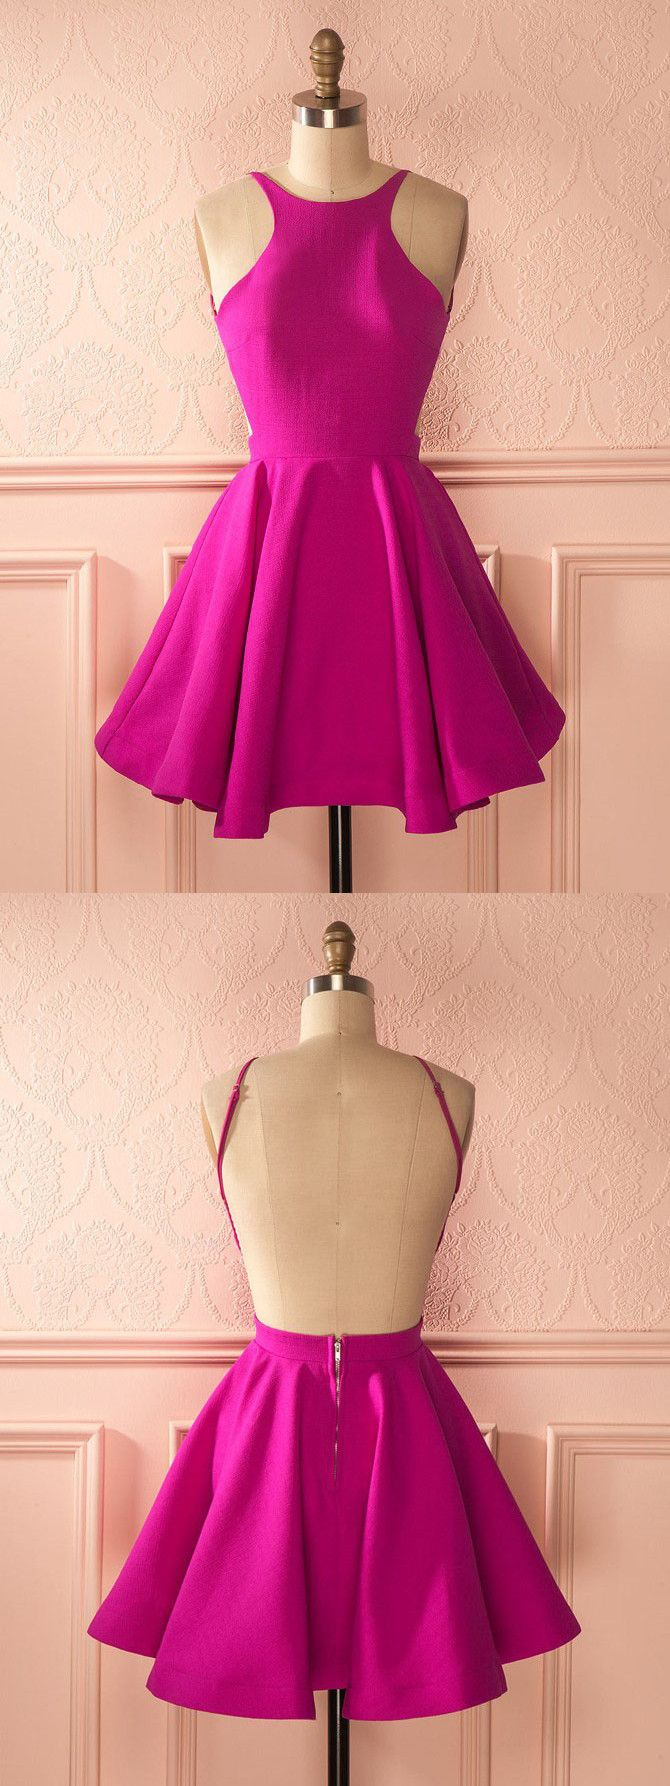 Hot pink homecoming dress  cute hot pink homecoming dress  homecoming dress backless